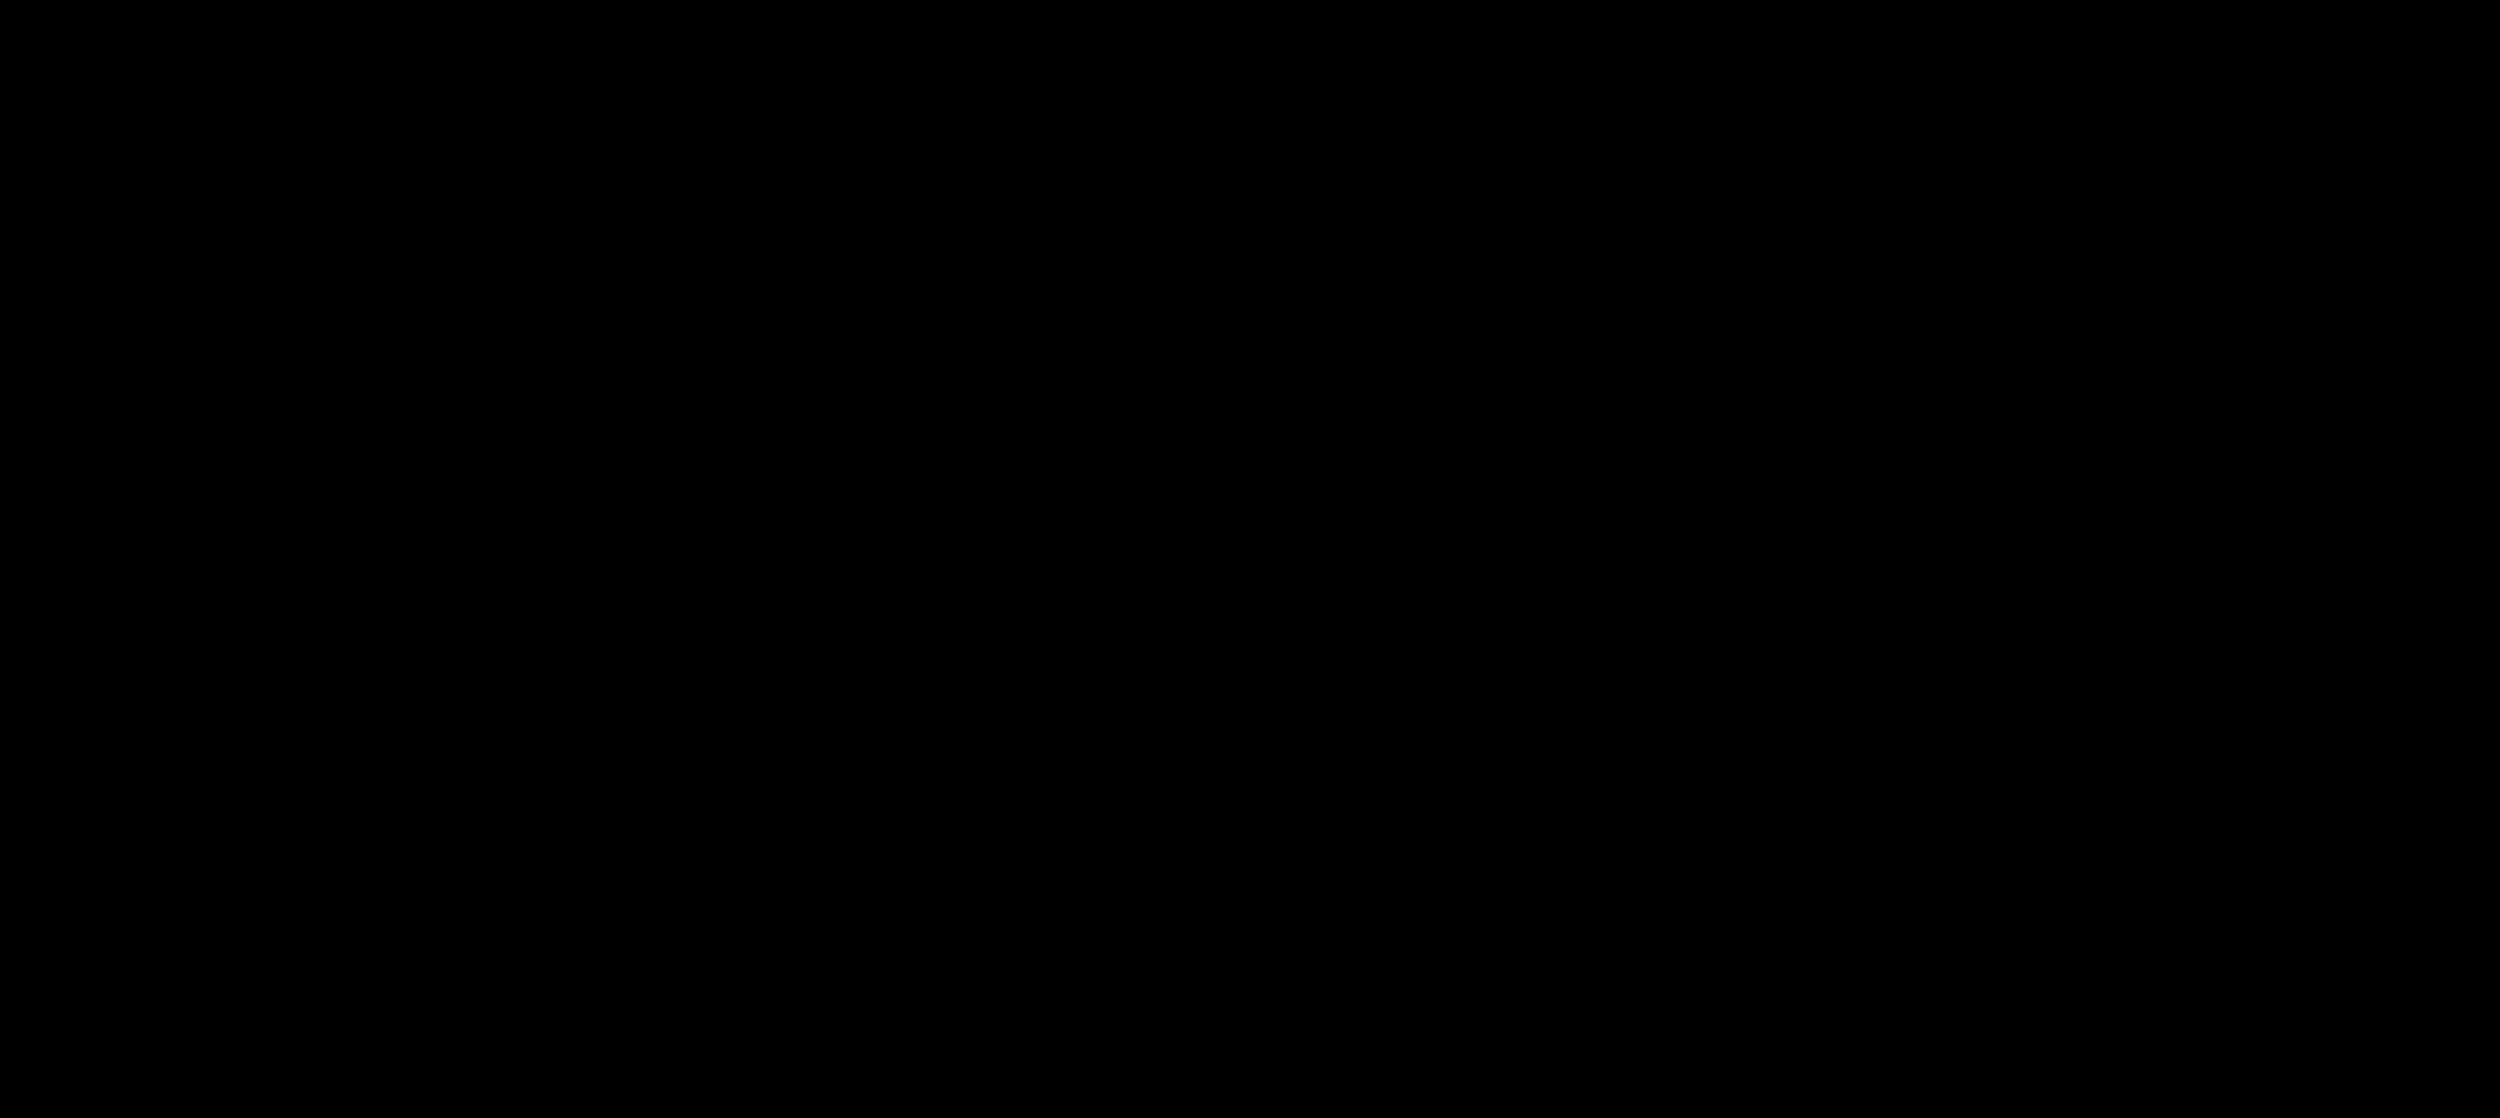 ABW_logo_black.png